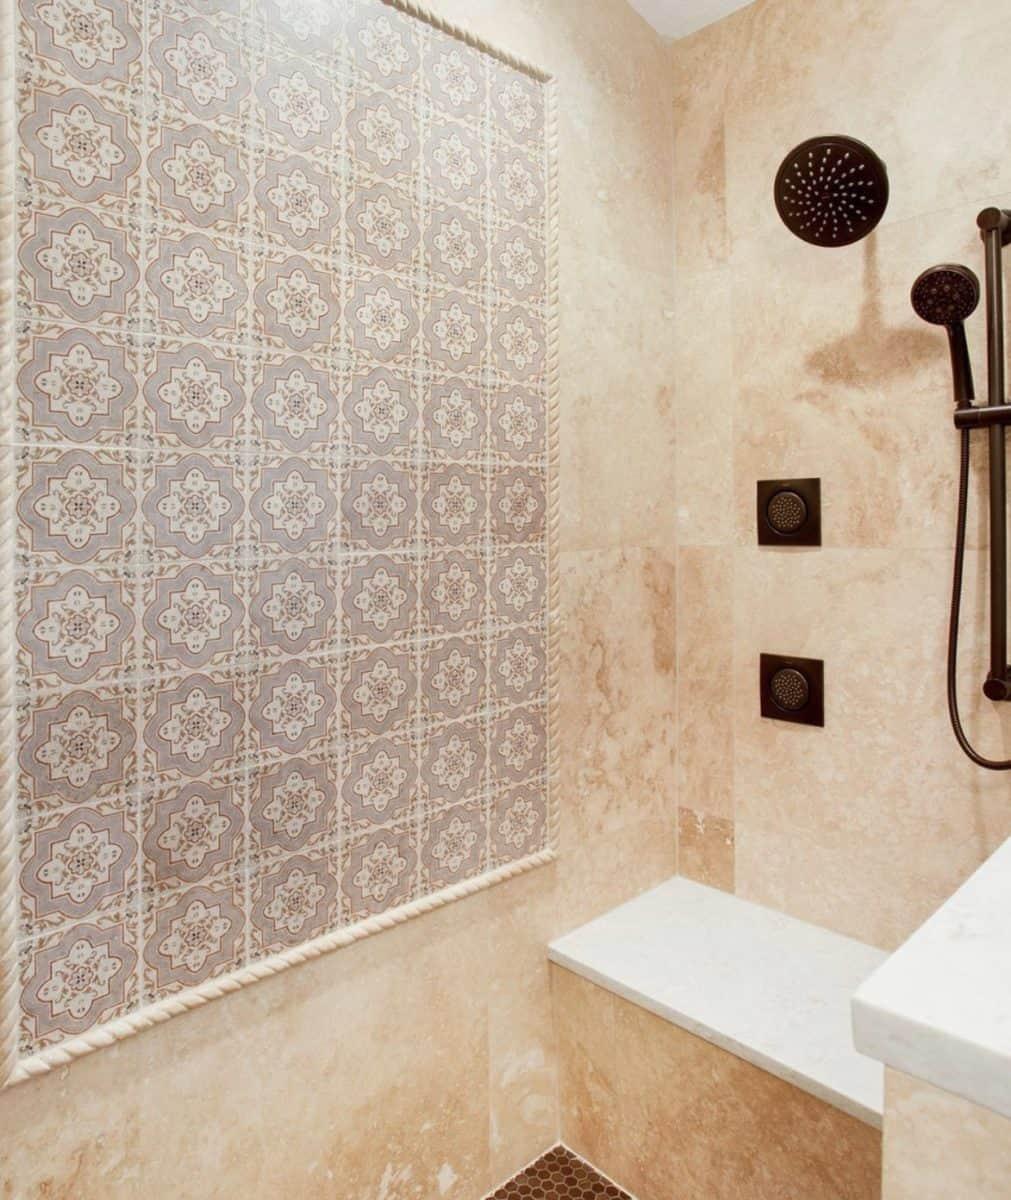 Rustic shower backsplash featuring the catalina pattern on limestone